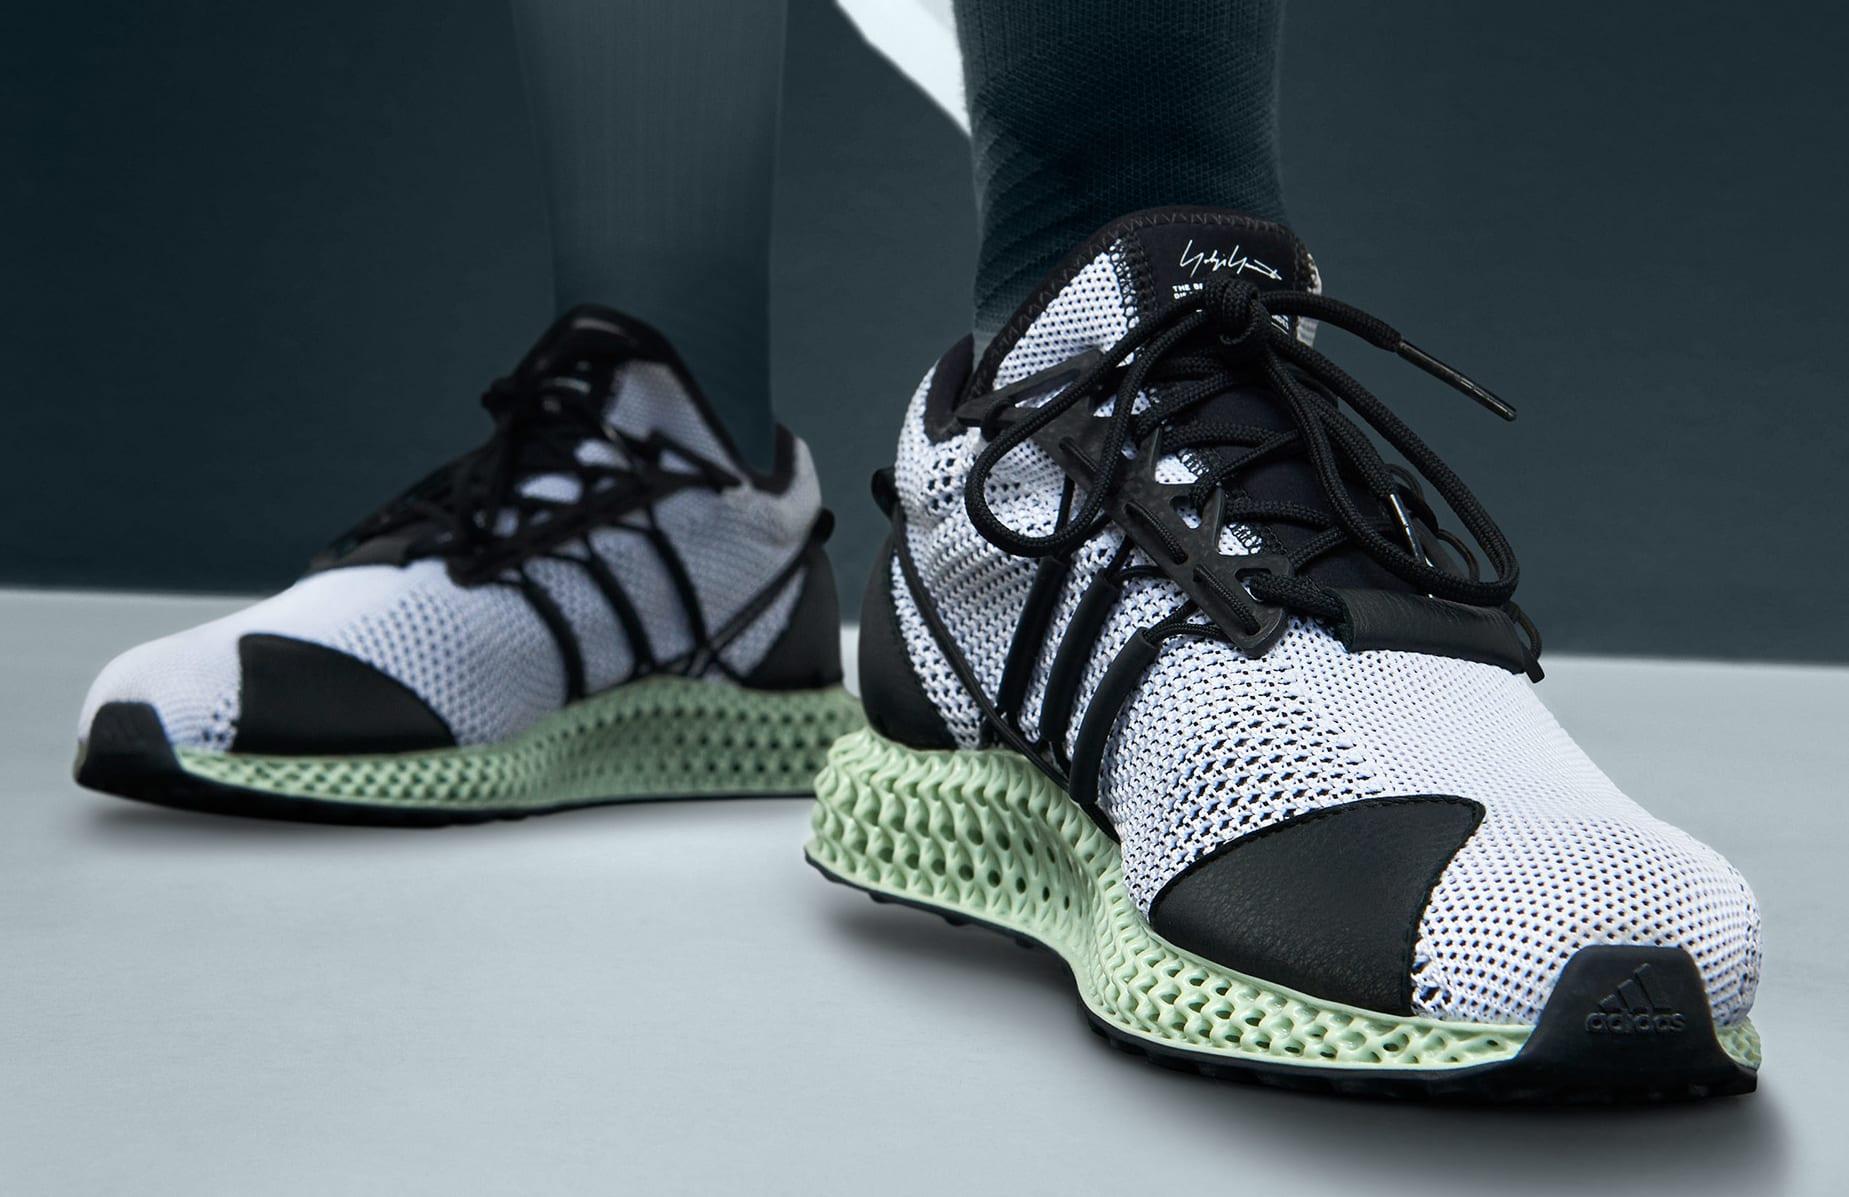 Adidas Y-3 Runner 4D AQ0357 1